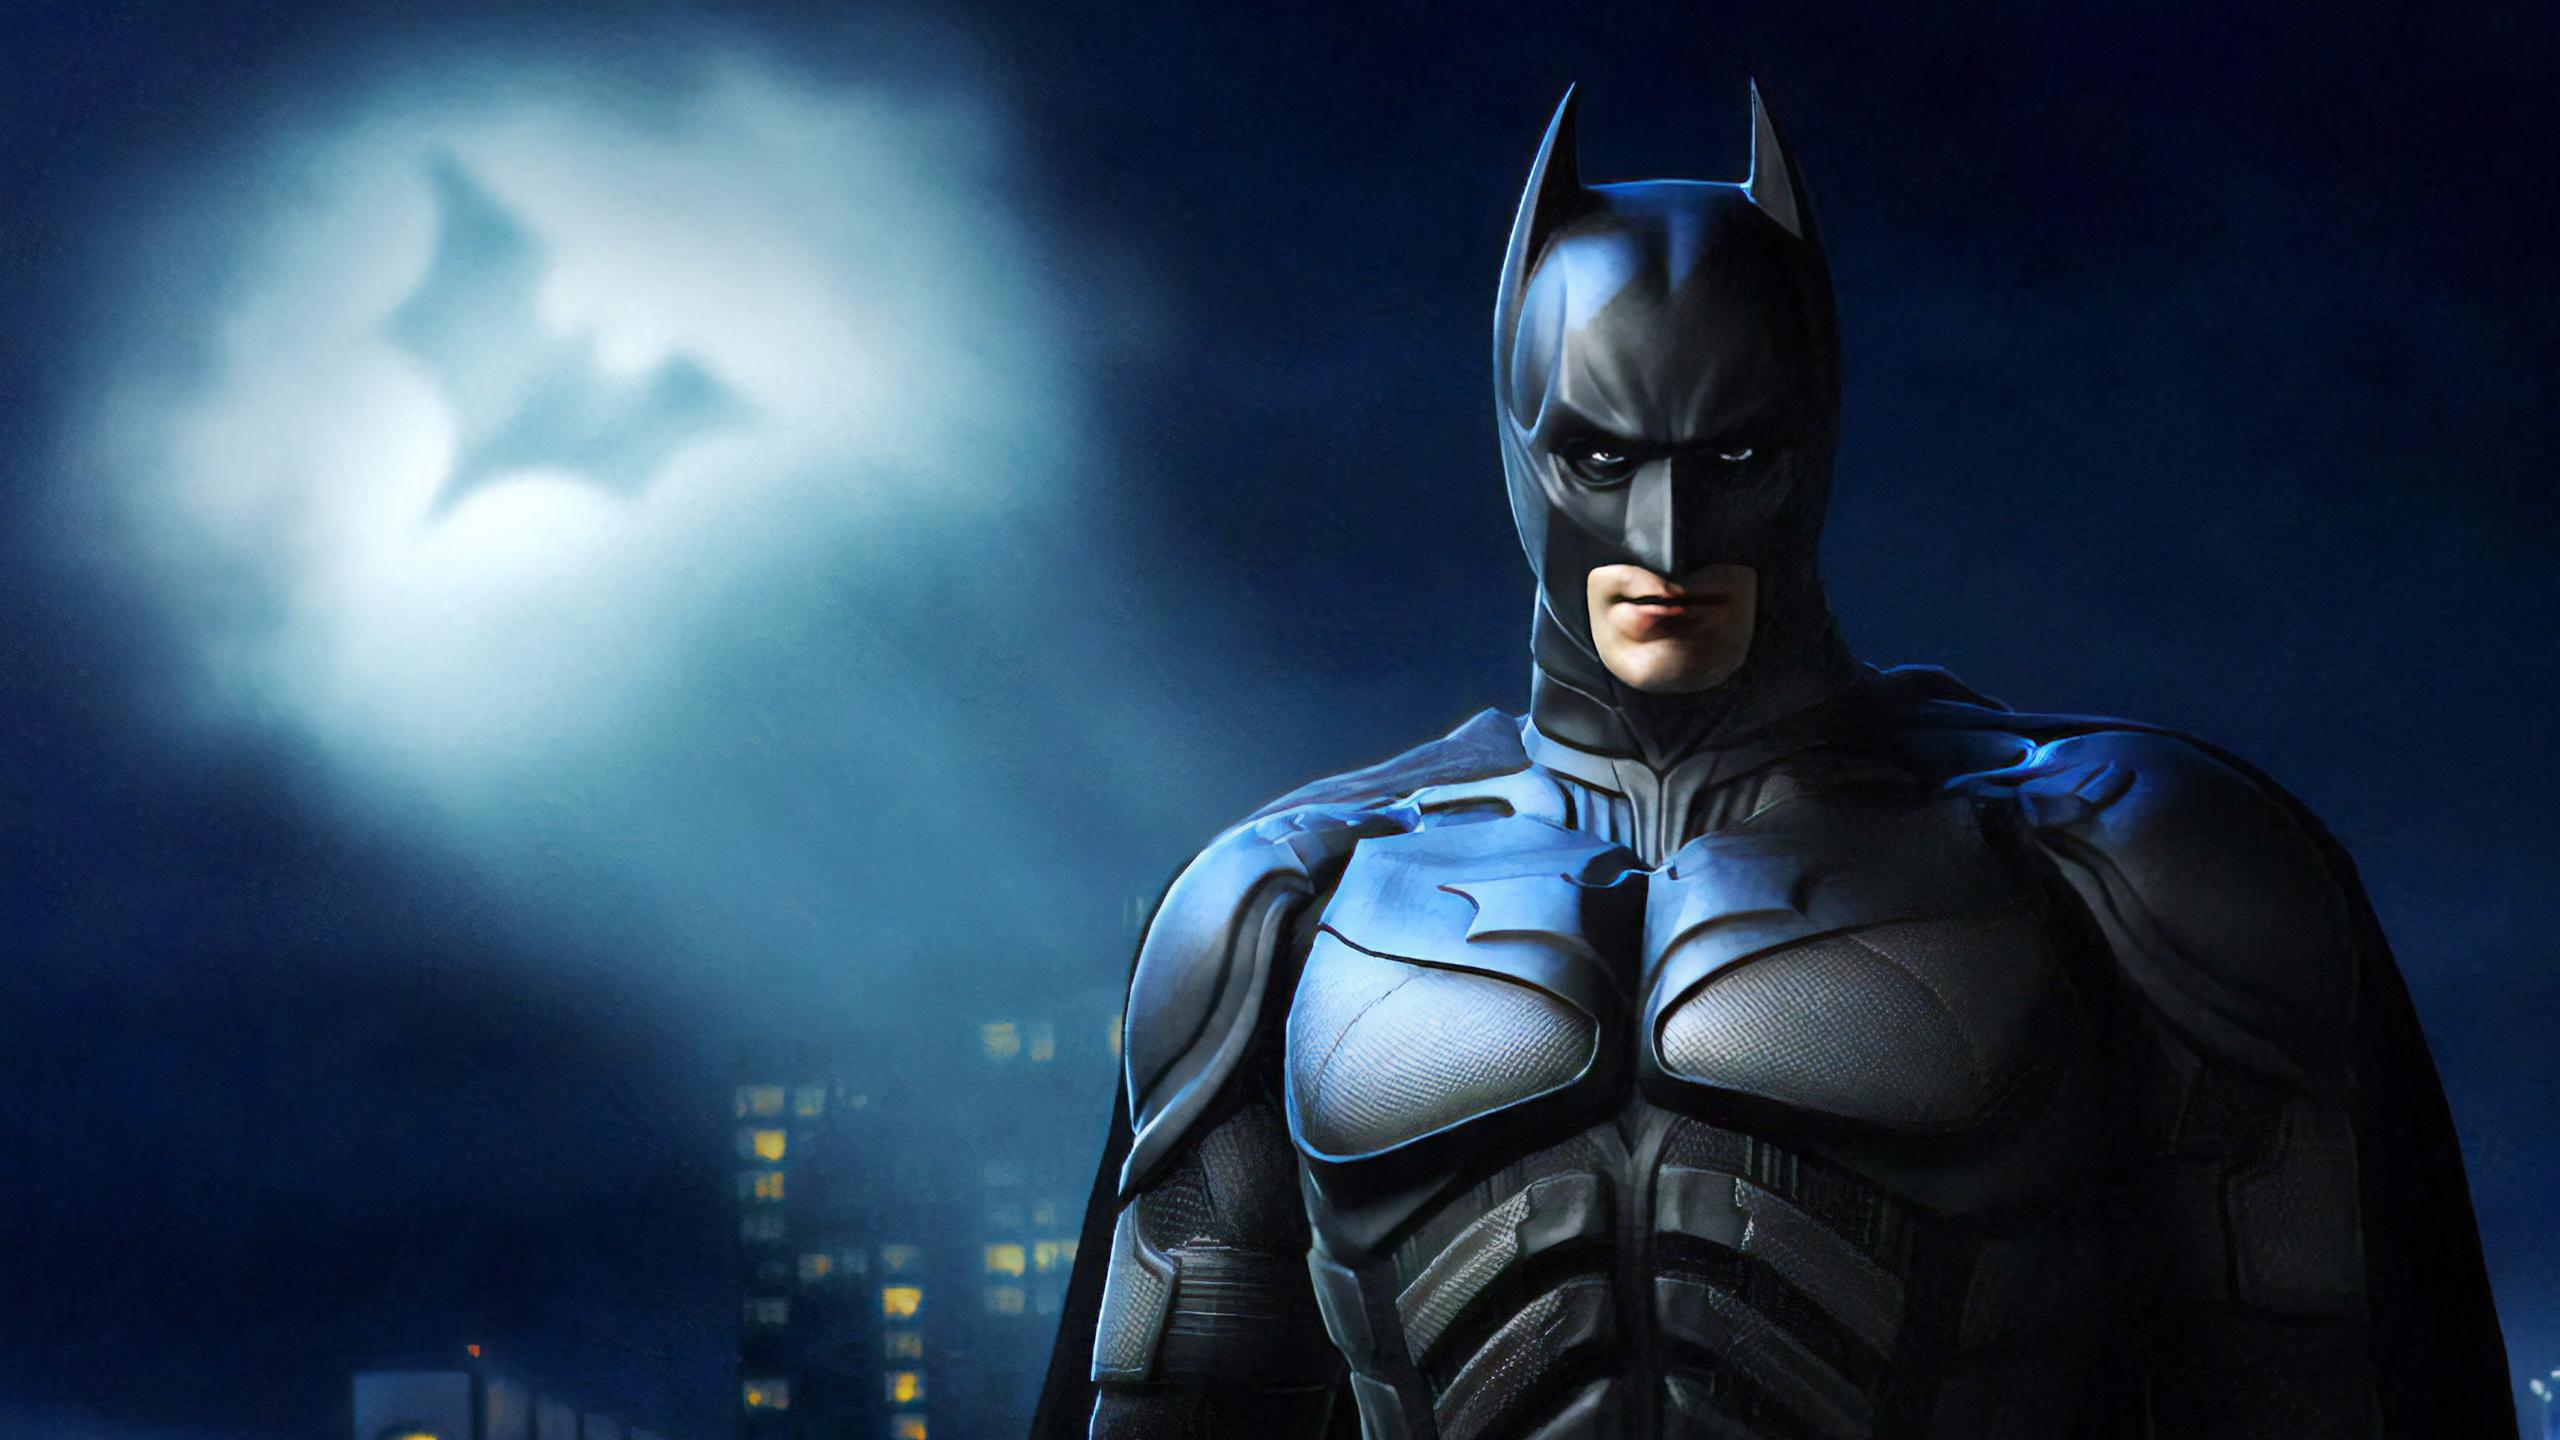 Batman Newart, HD Superheroes, 4k Wallpapers, Images ...